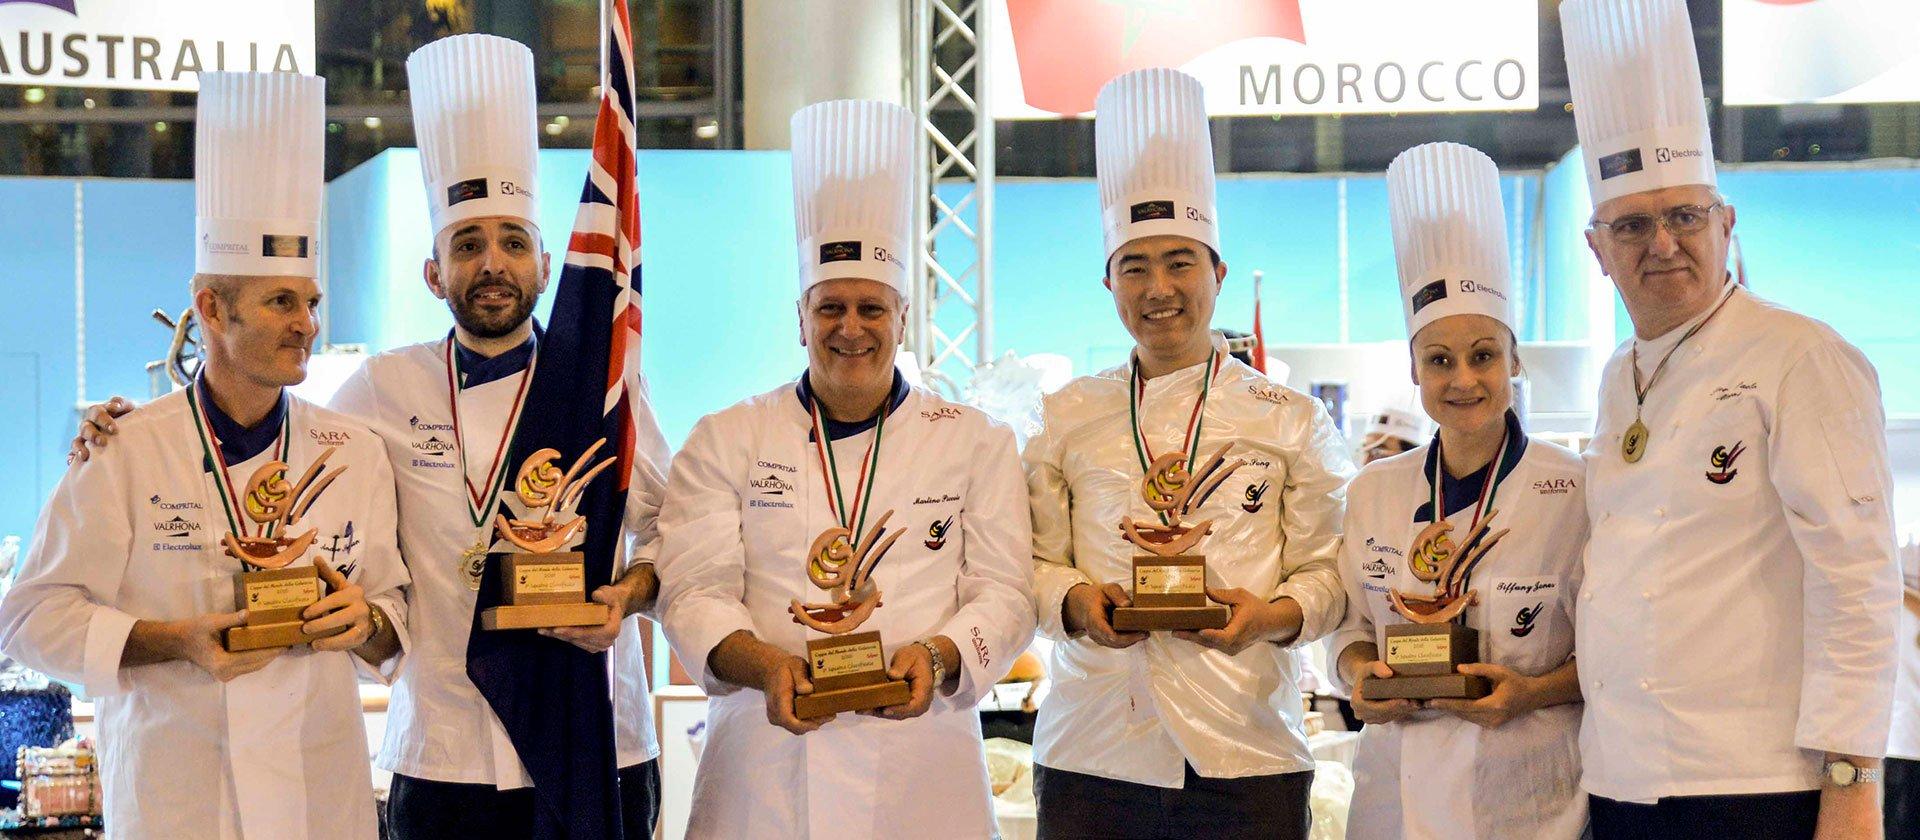 Le Cordon Bleu Sydney Chef Andre Sandison wins Gelato World Cup 2016